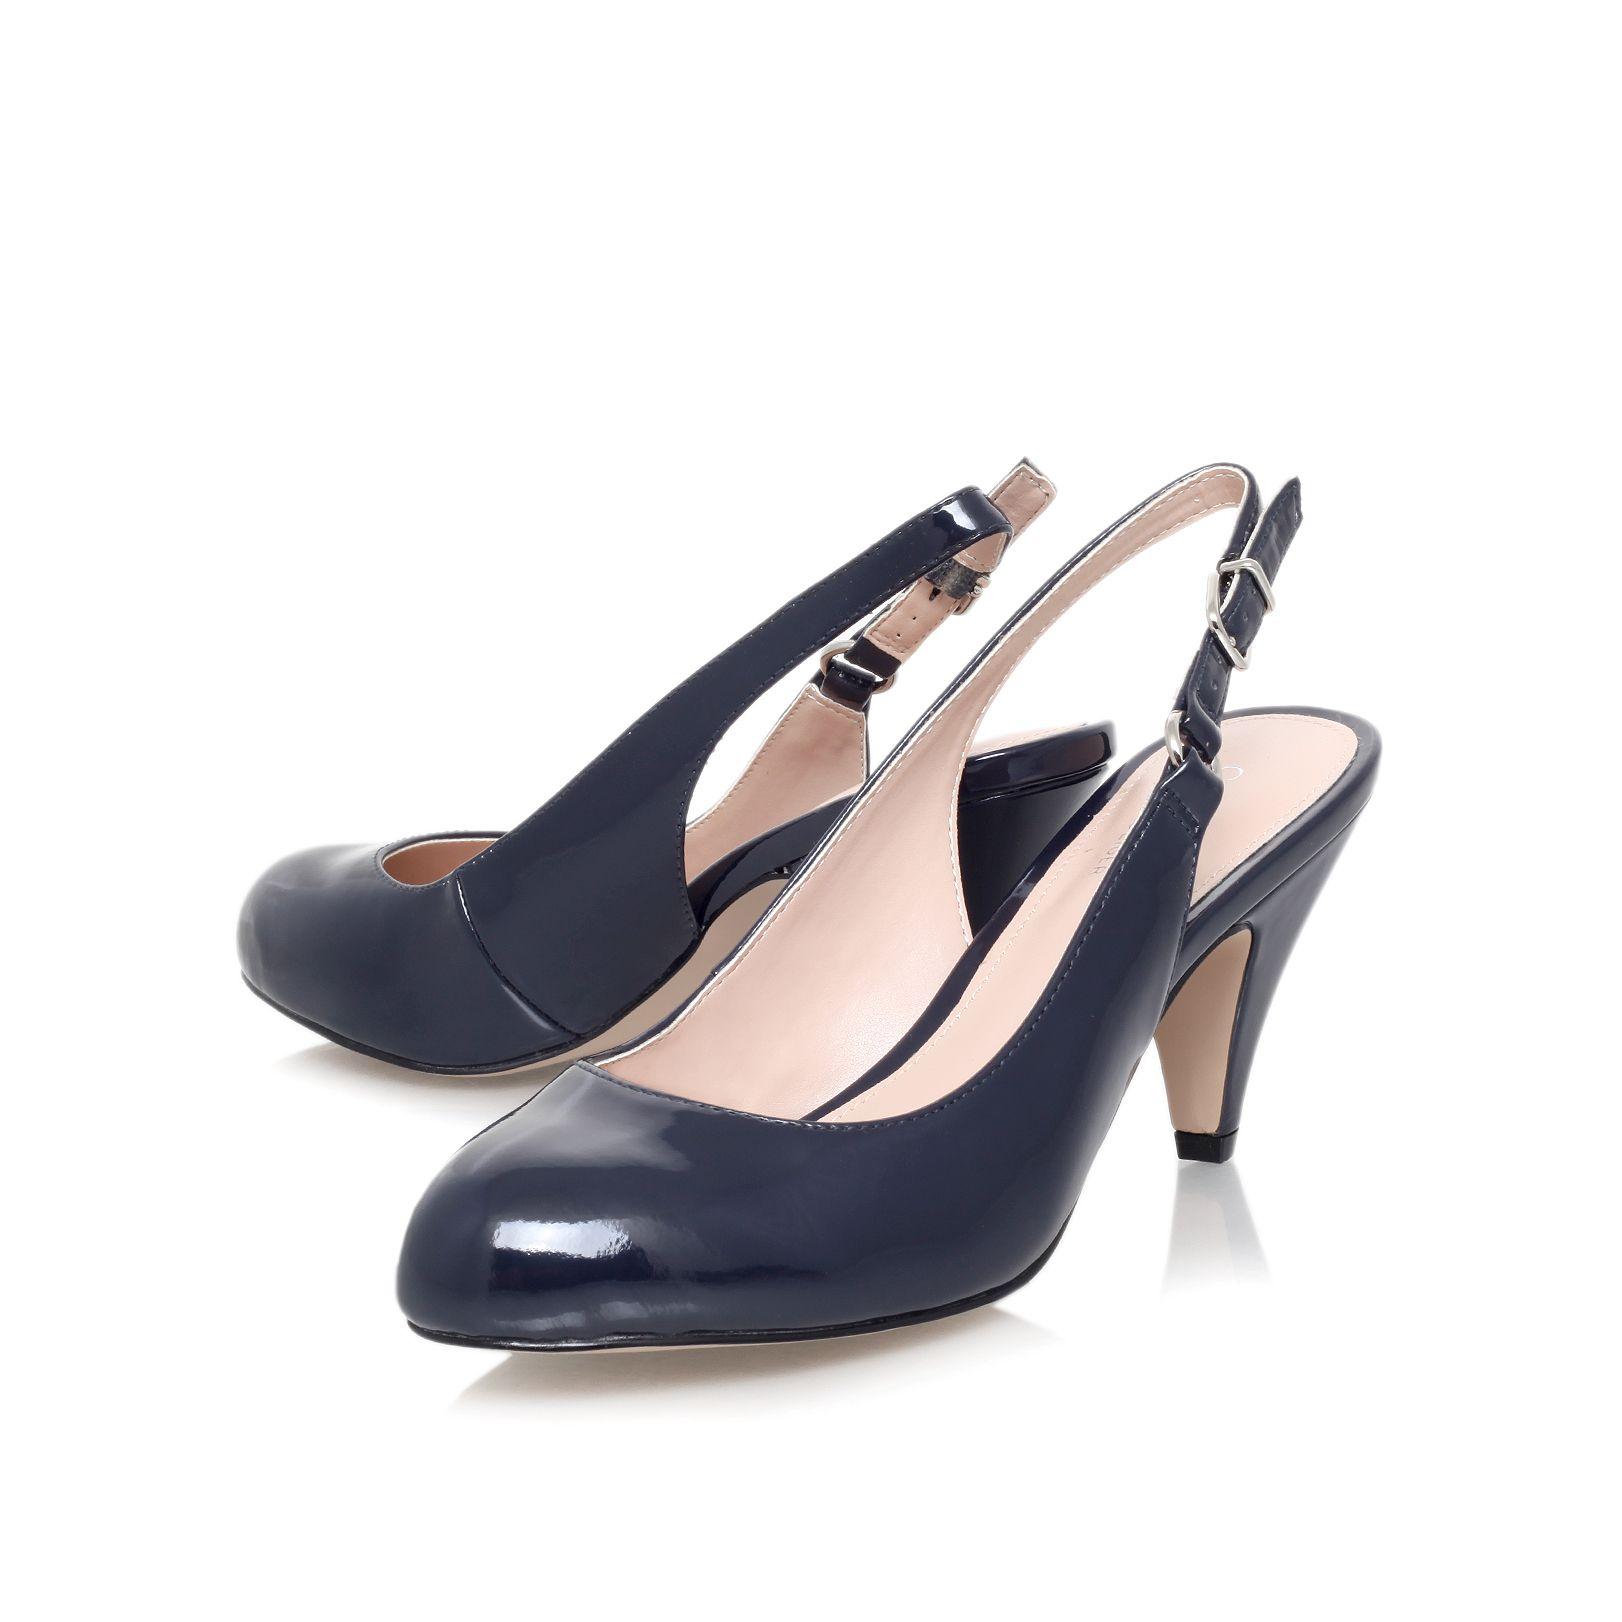 Navy Court Shoes Mid Heel Australia